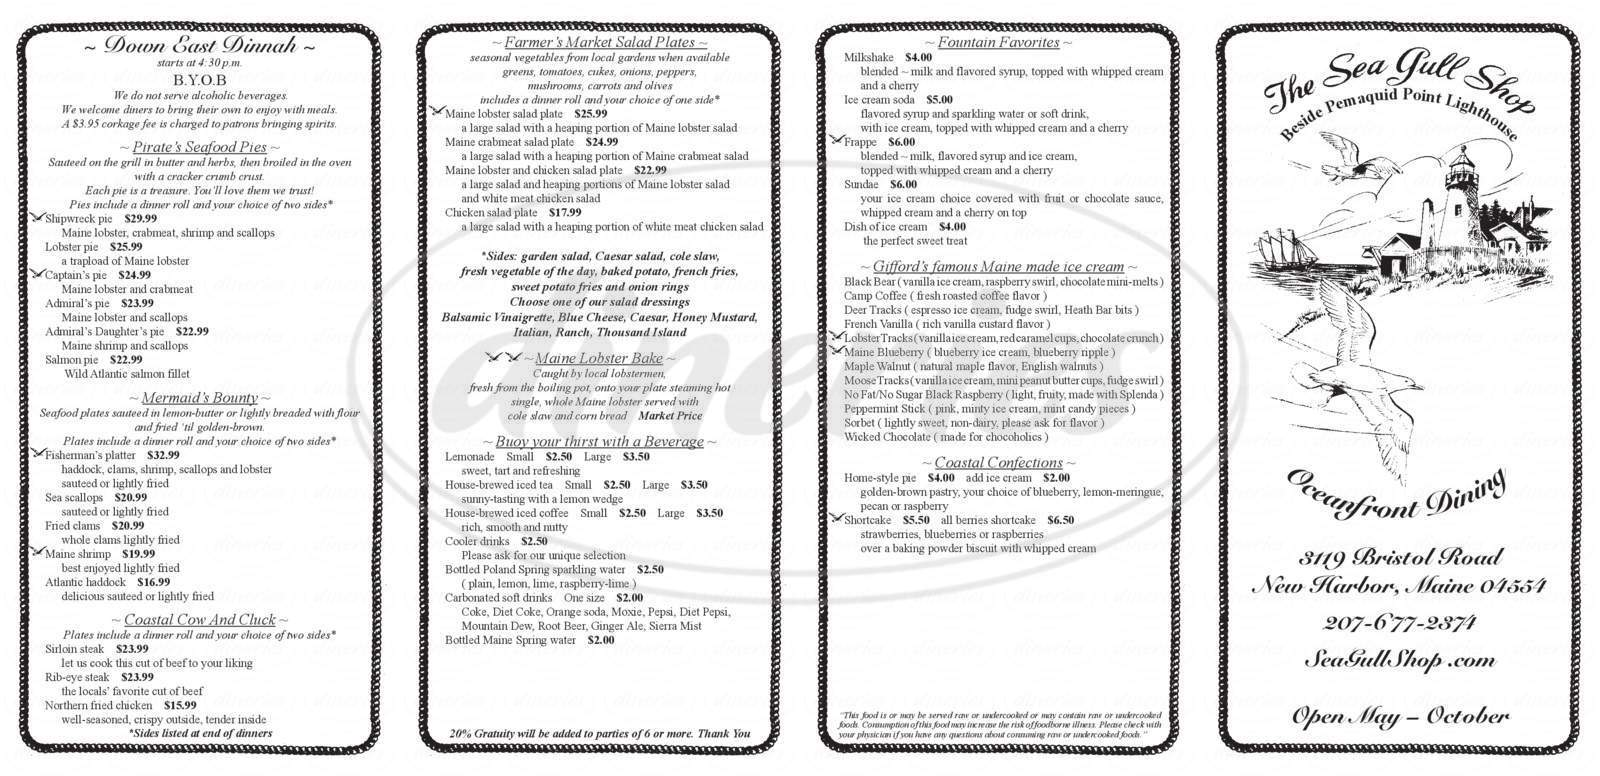 menu for Sea Gull Restaurant & Gift Shop